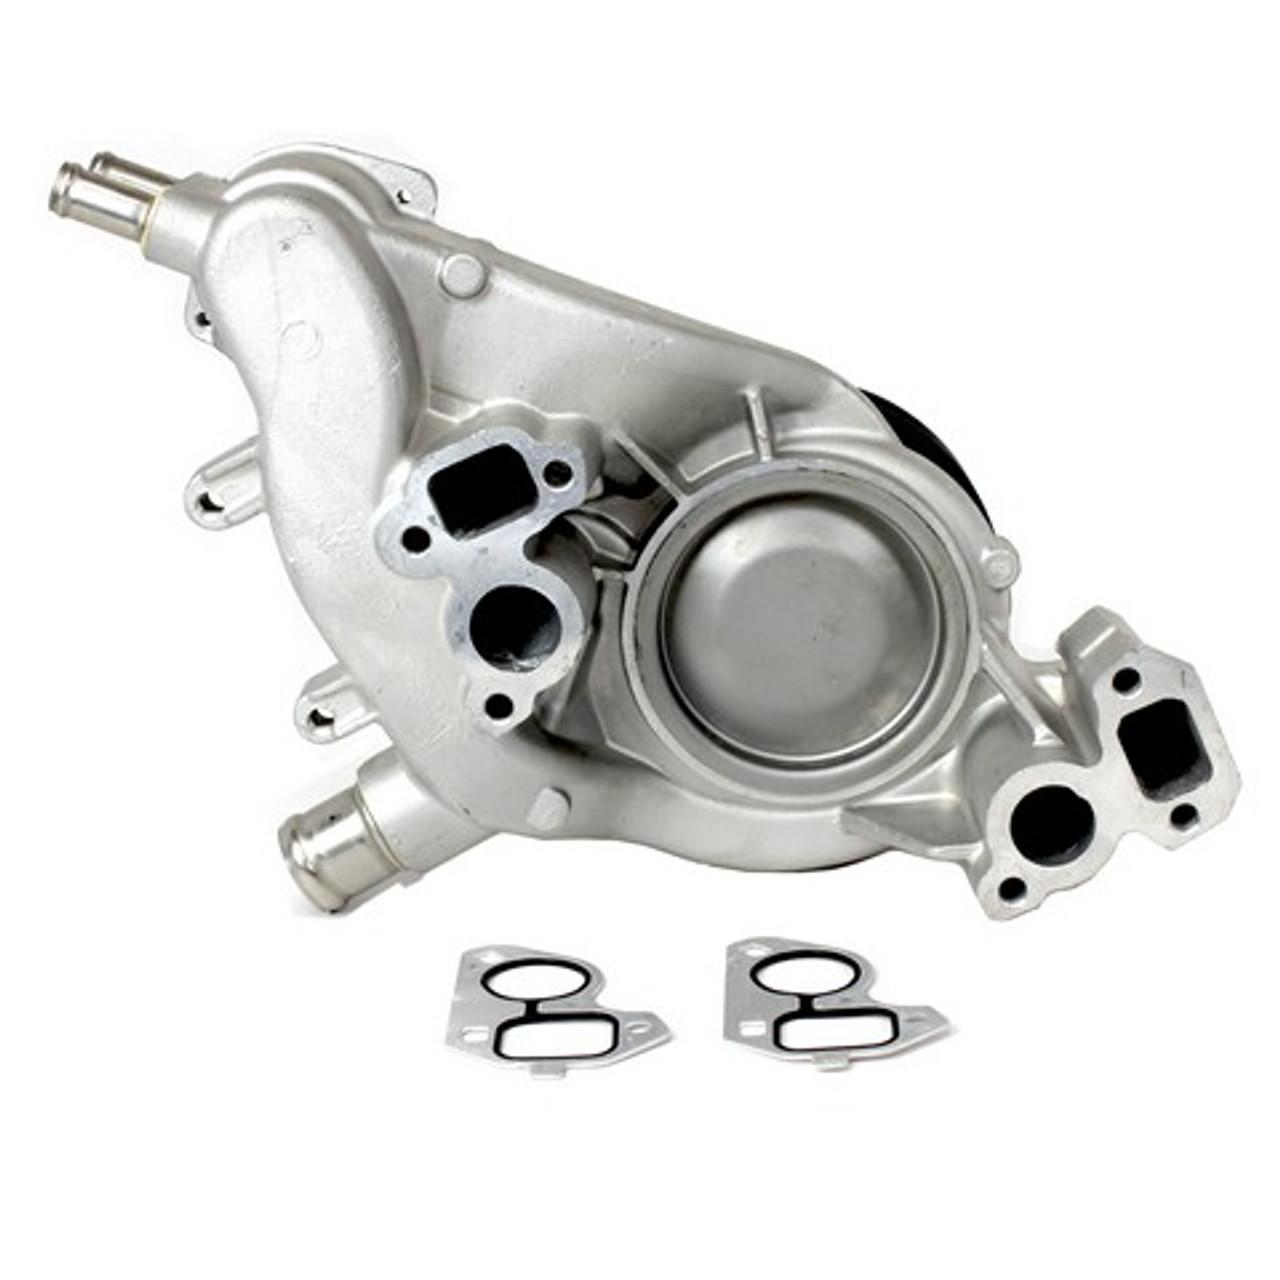 2009 GMC Yukon XL 2500 6.0L Water Pump WP3169.E323